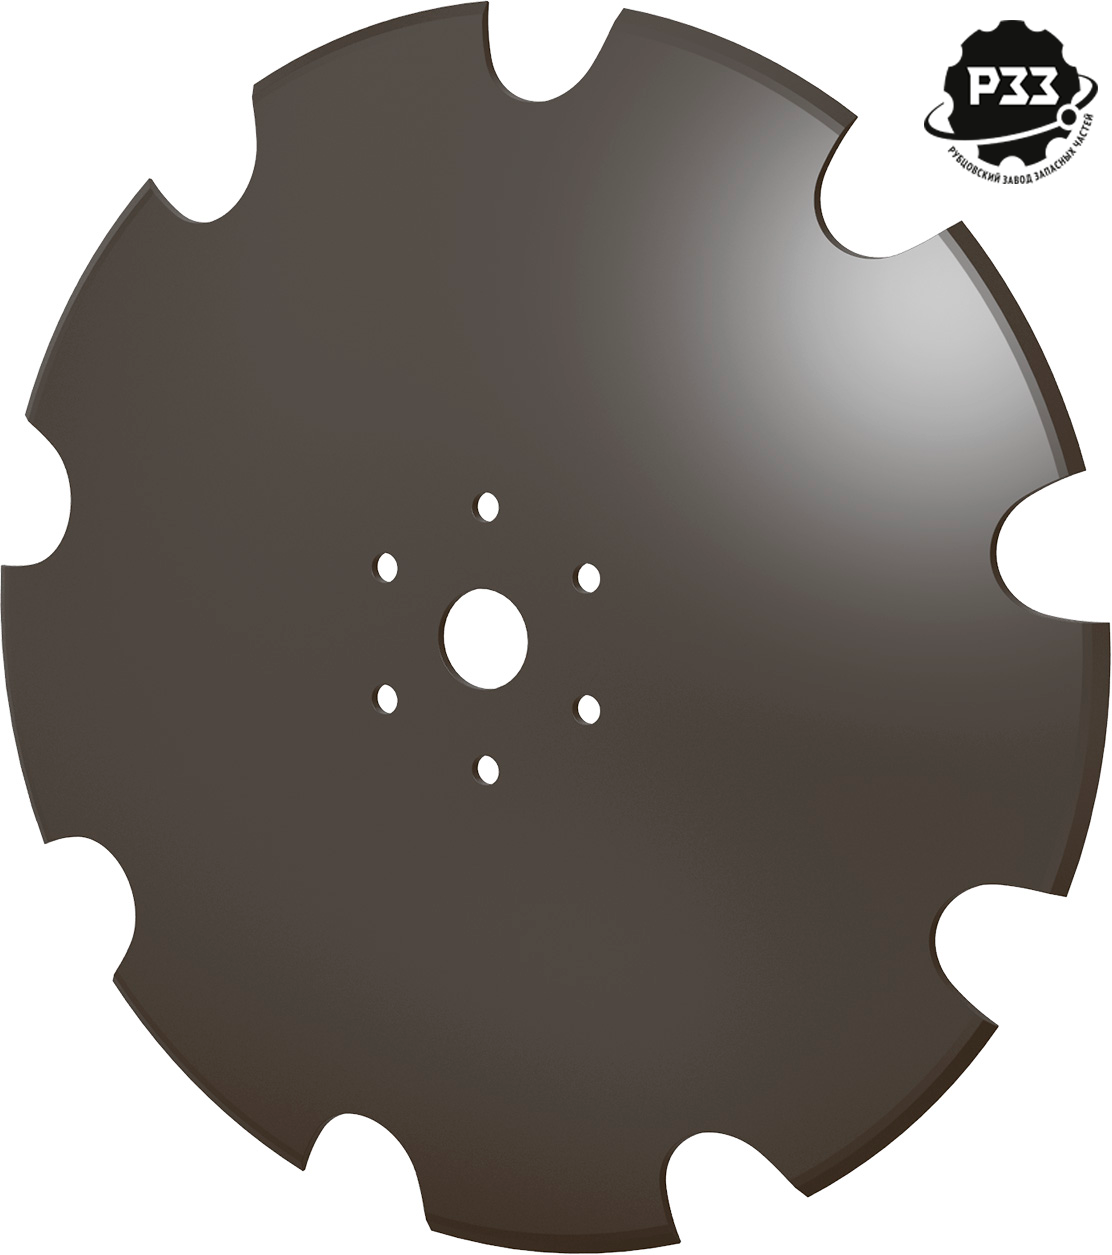 DANA БДН-2,4×2  DISK_BDM_%20VORDI_RZZ2.jpg